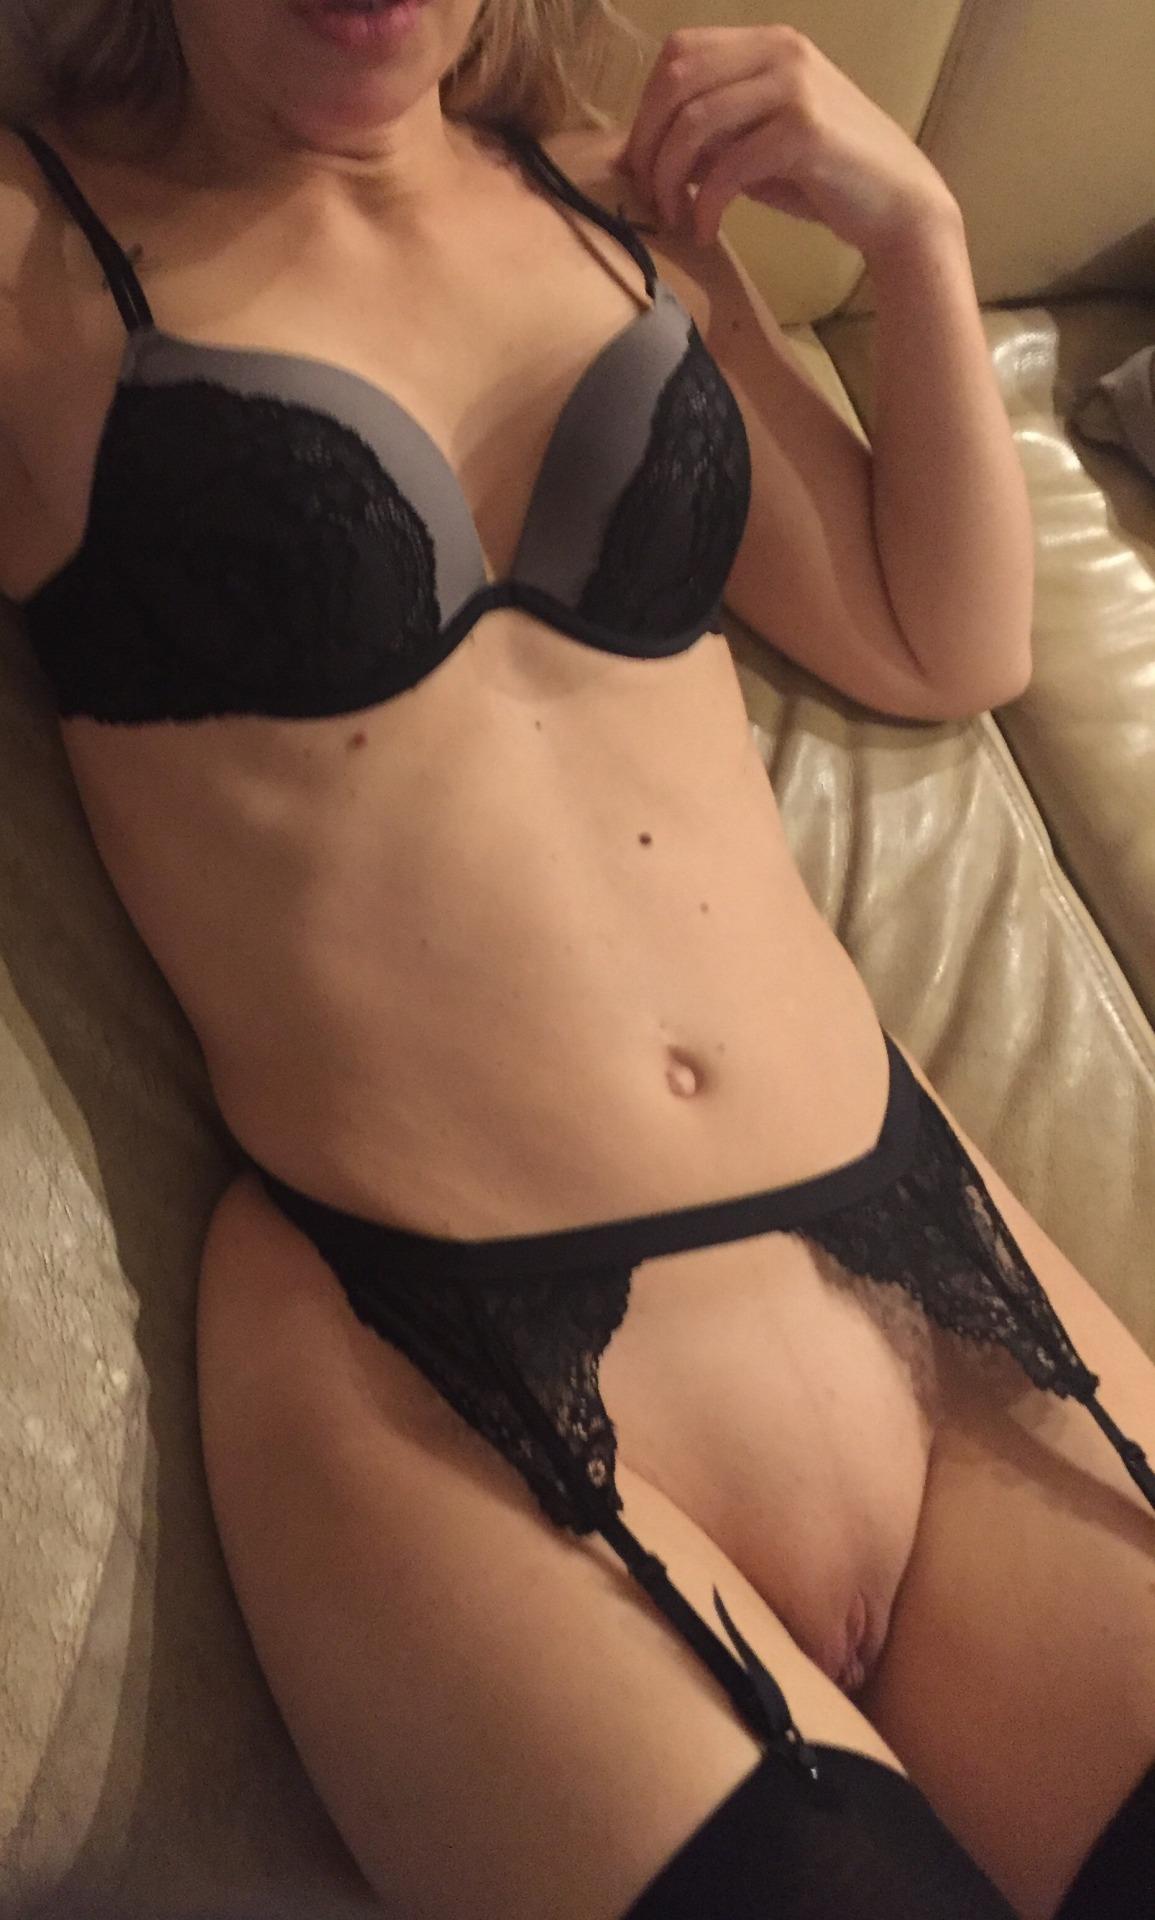 photo sexe de femme du 58 hot sexy